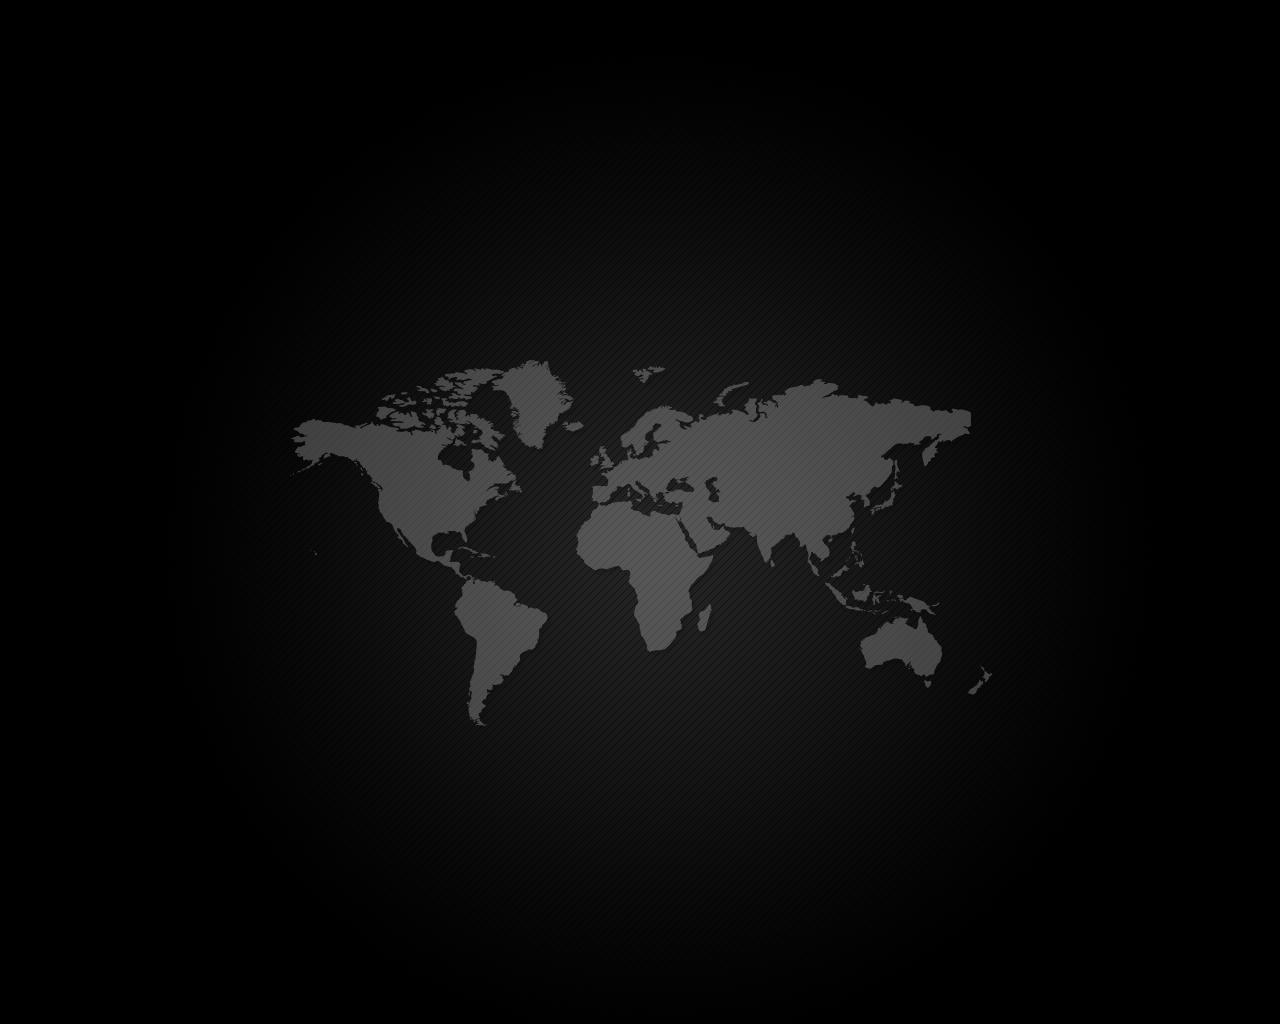 Worldmap by physicalmagic on deviantart worldmap by physicalmagic worldmap by physicalmagic gumiabroncs Choice Image